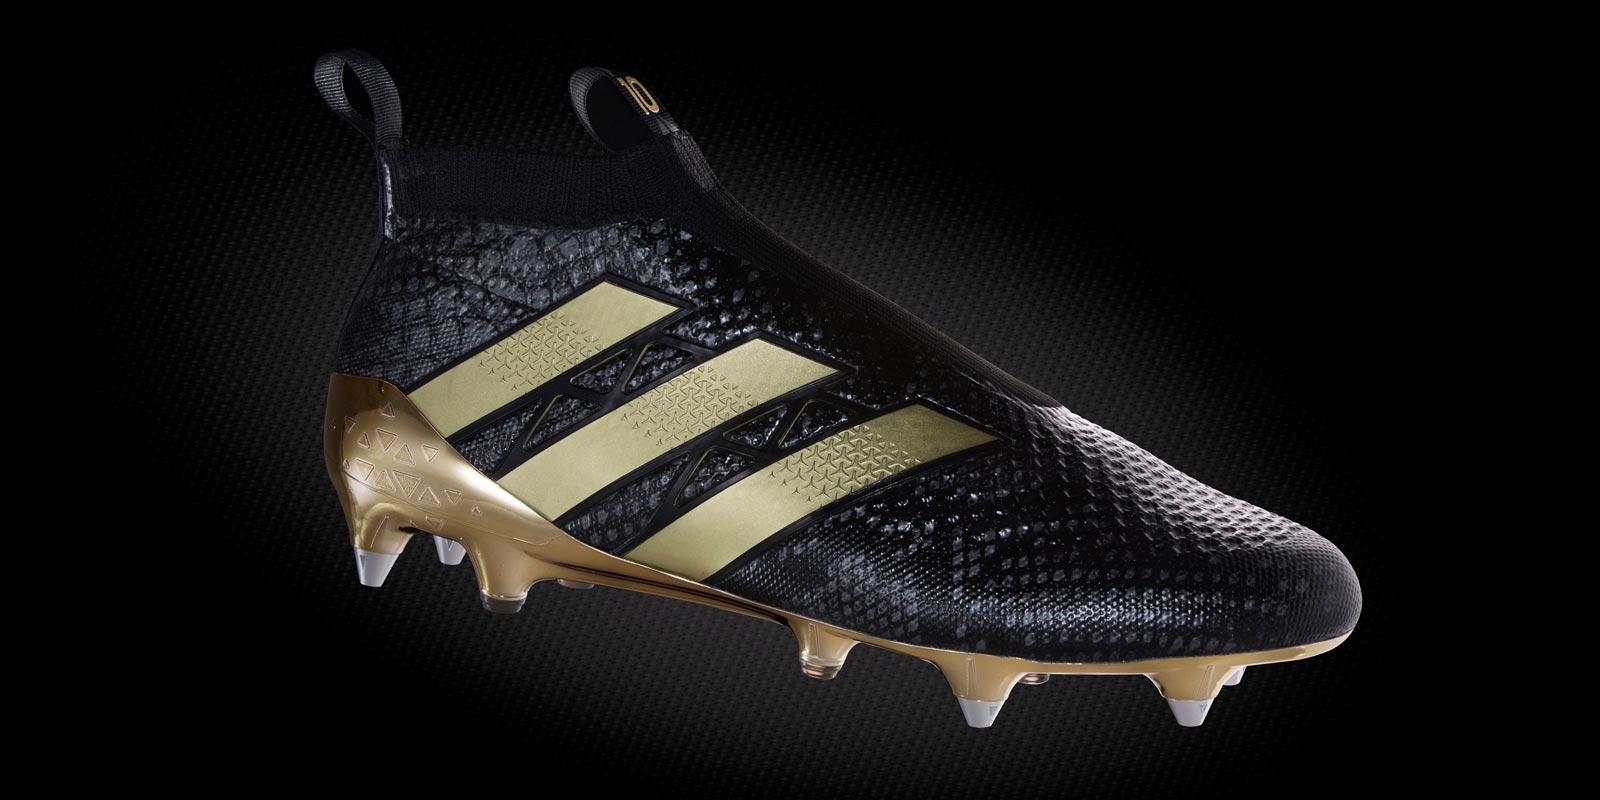 Adidas Pogbance Boots Released - Paul Pogba Boots 6b518c0baa8ed